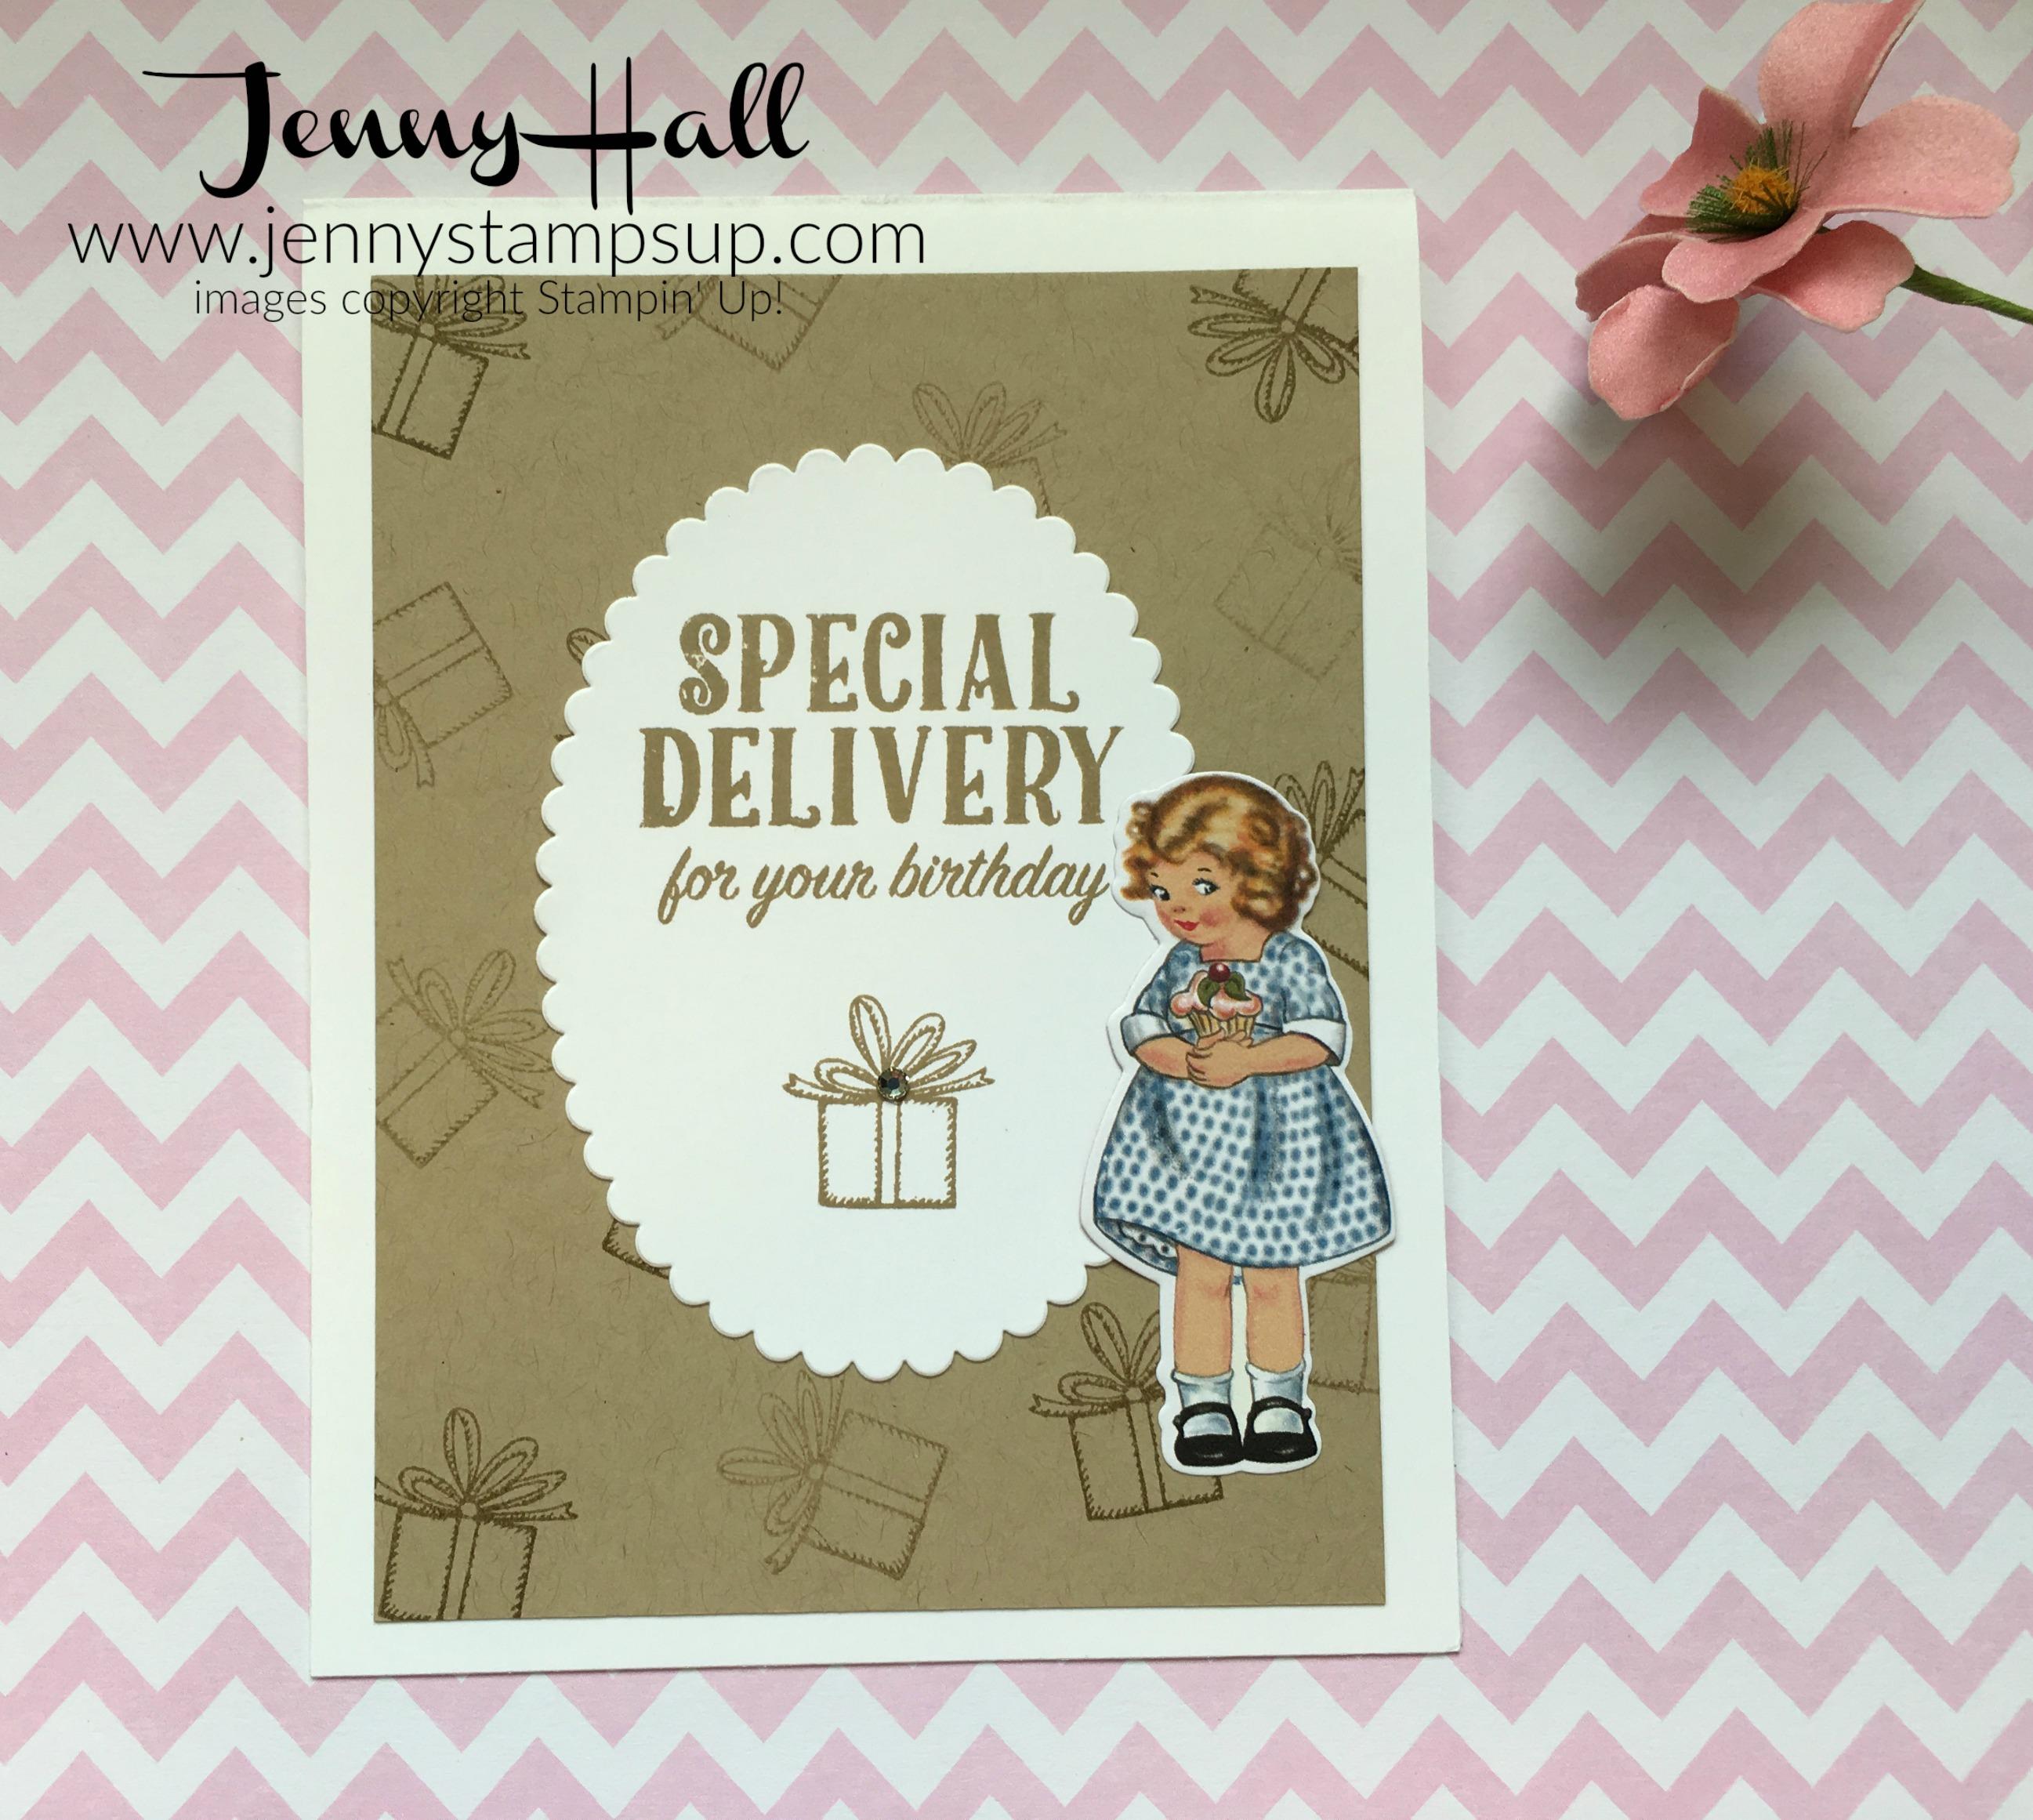 Birthday Delivery by Jenny Hall www.jennystampsup.com